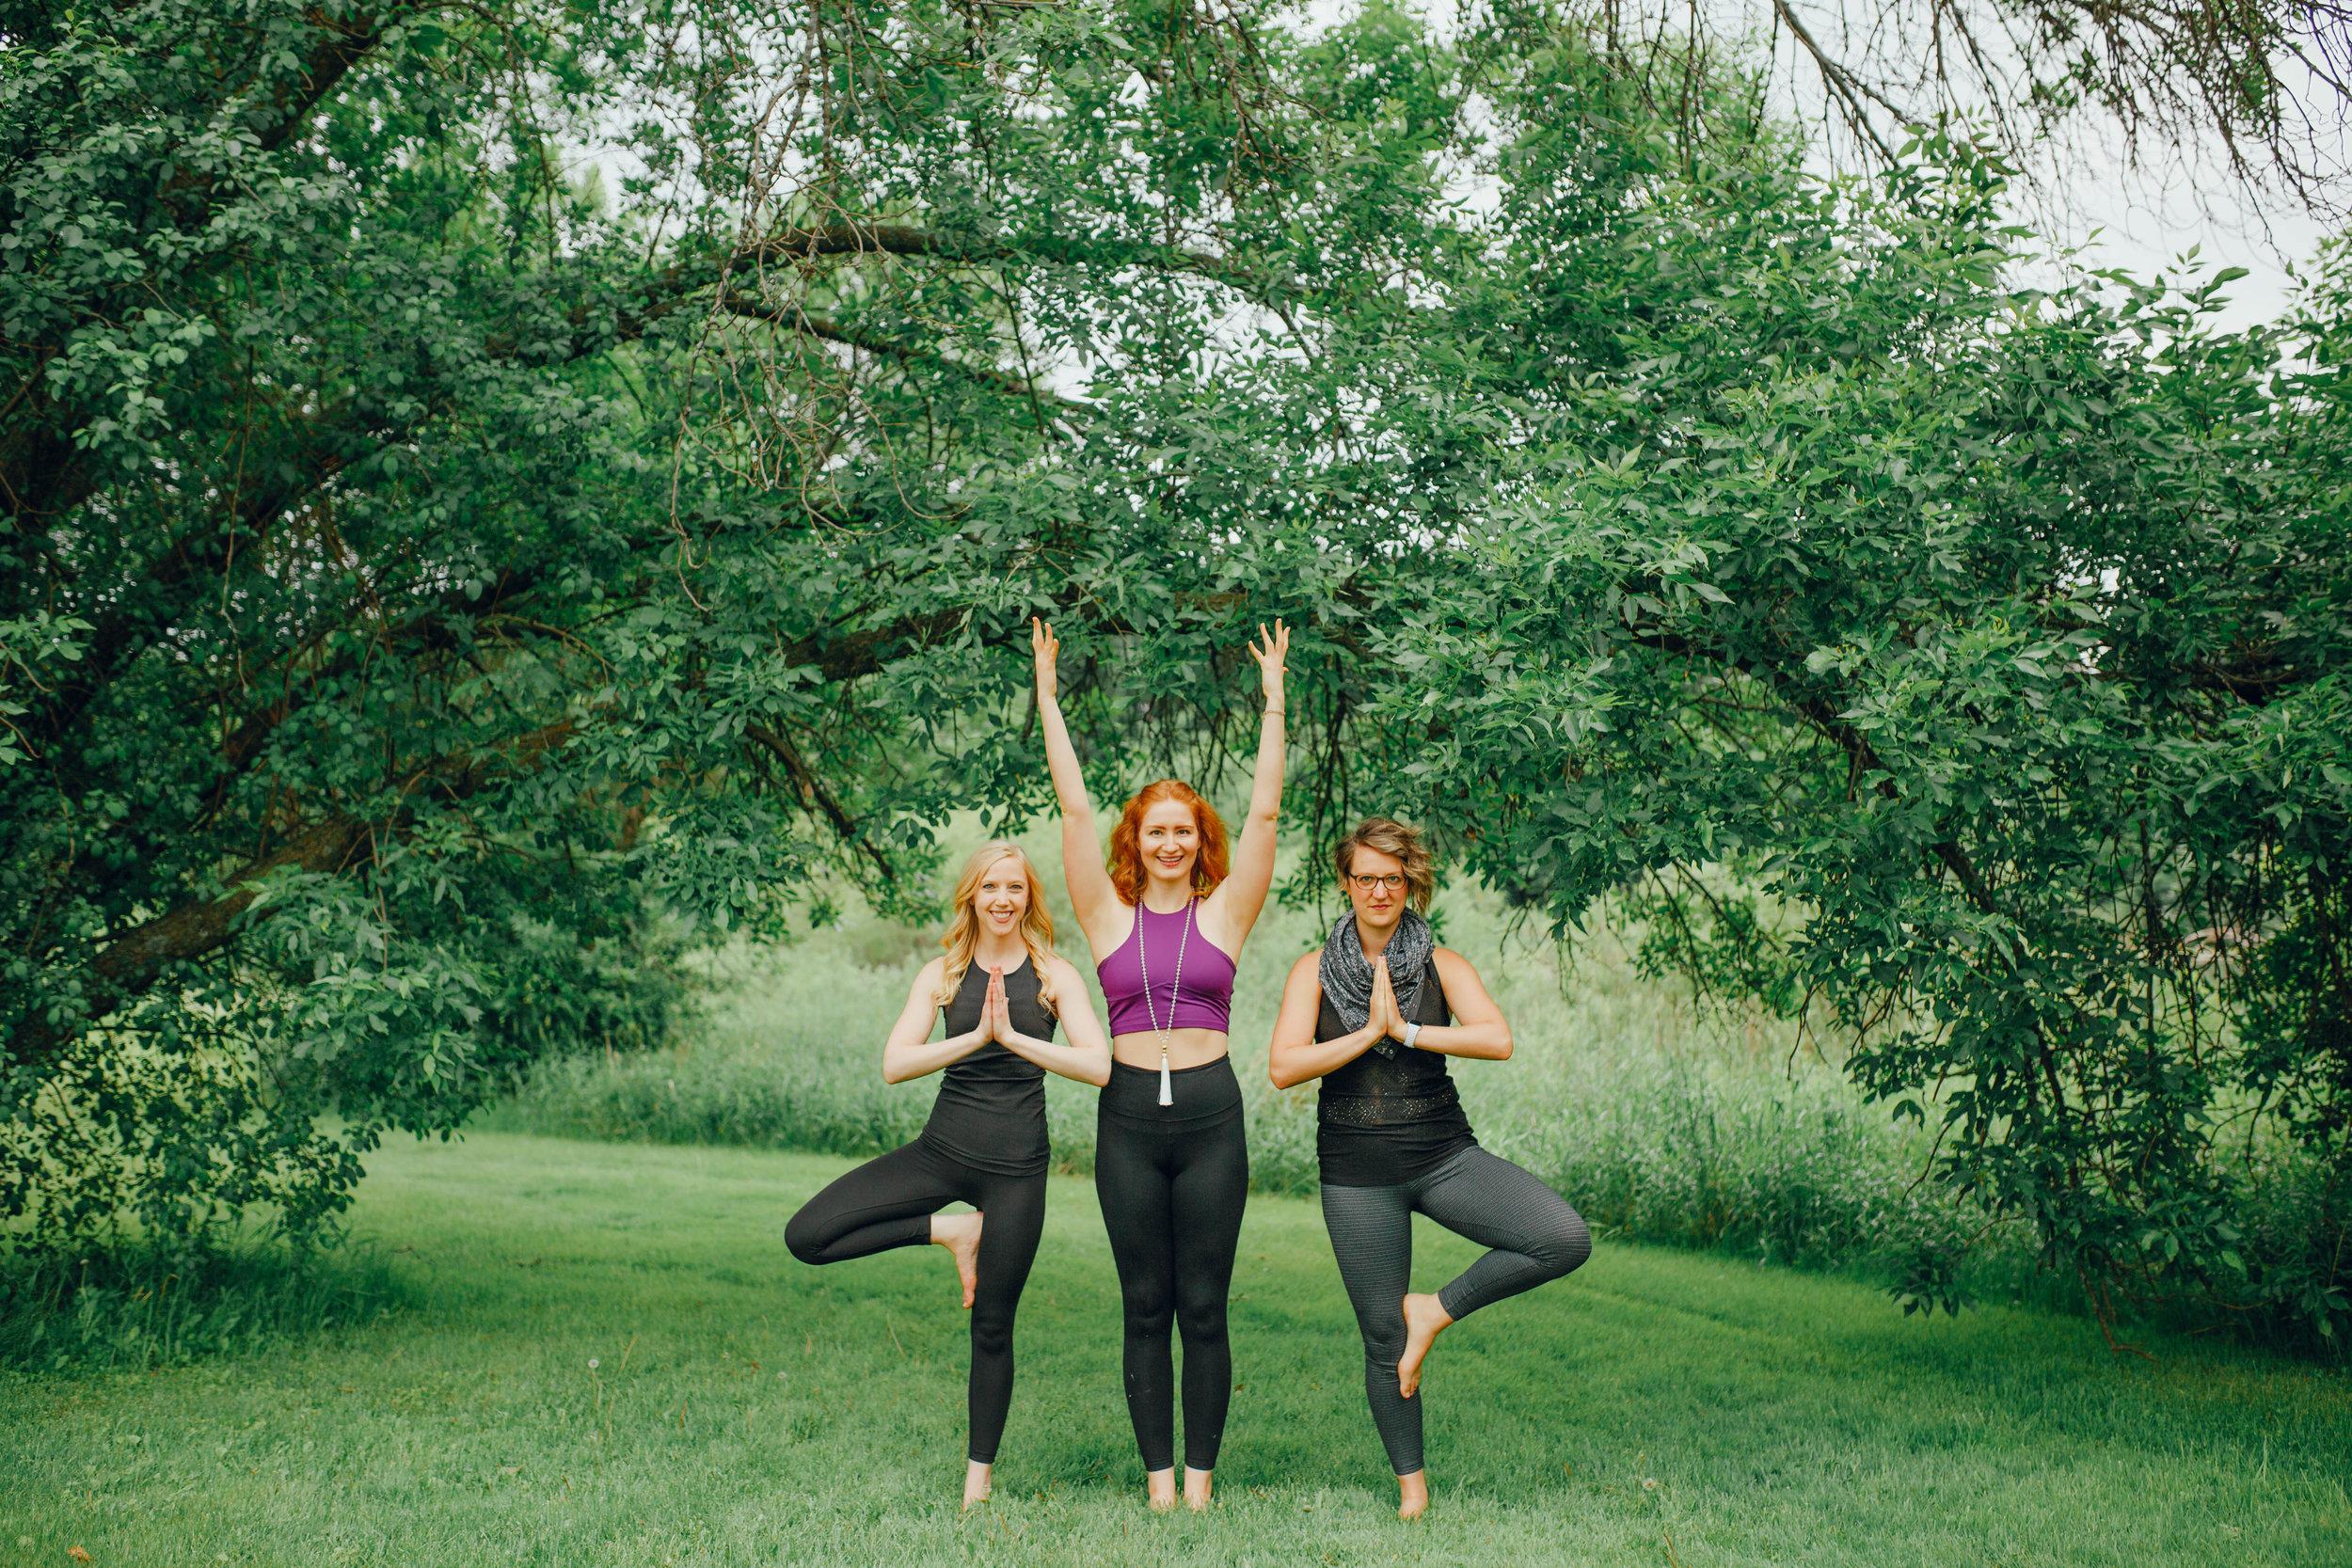 Minnesota, MN, Define Fettle, DefineYOU Retreat, The Define You Retreat, Minneapolis, Health, Fitness, Yoga, Barre, Restoration, Up Norht